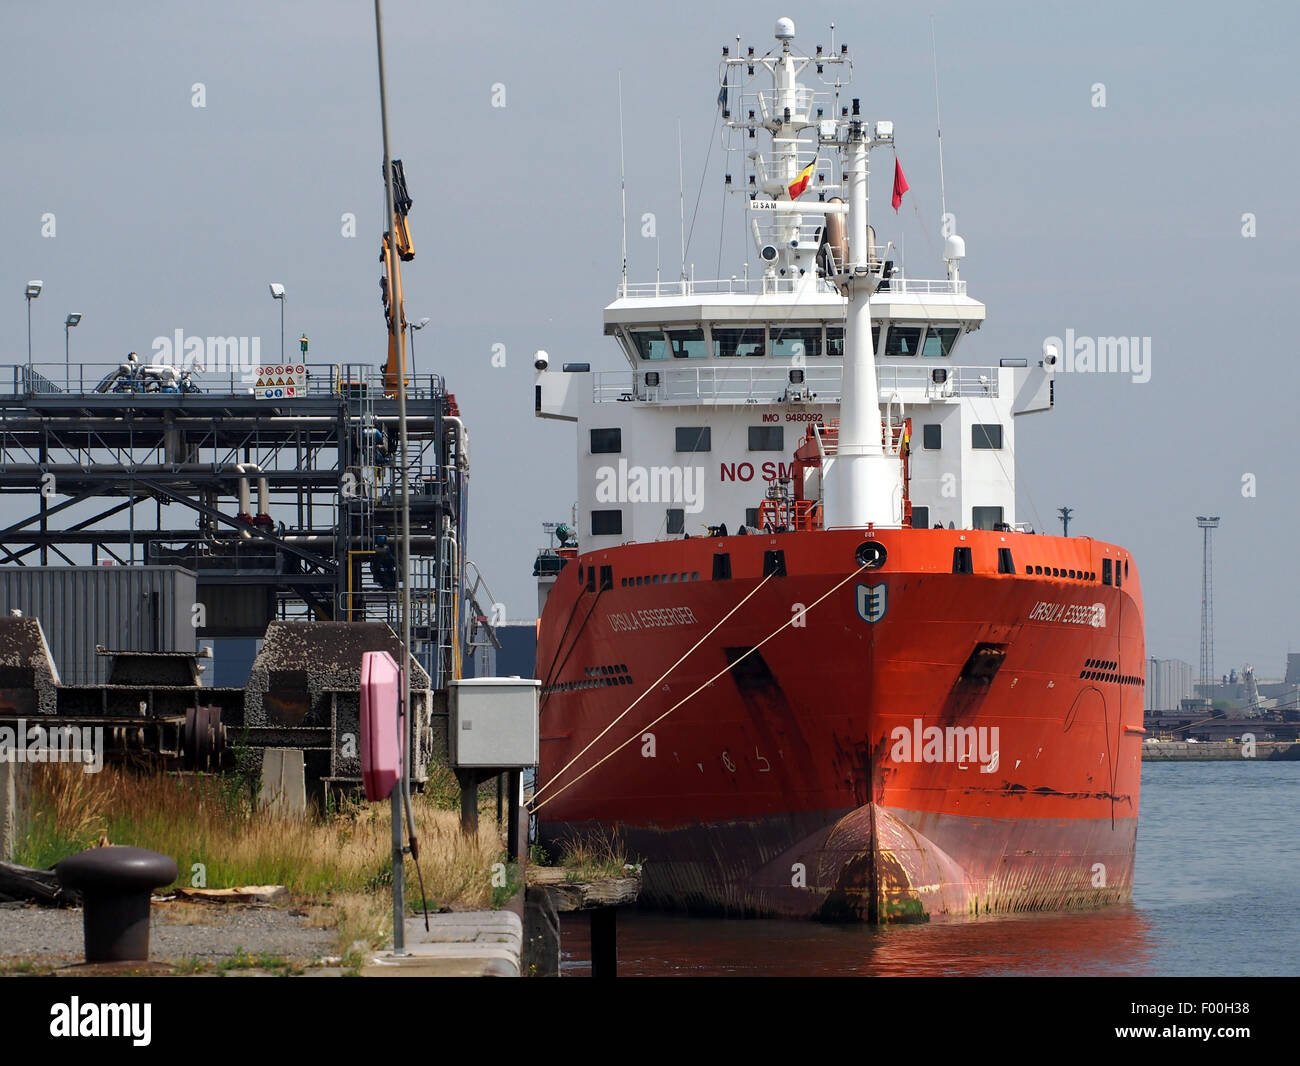 Ursula Essberger - IMO 9480992, Port of Antwerp - Stock Image